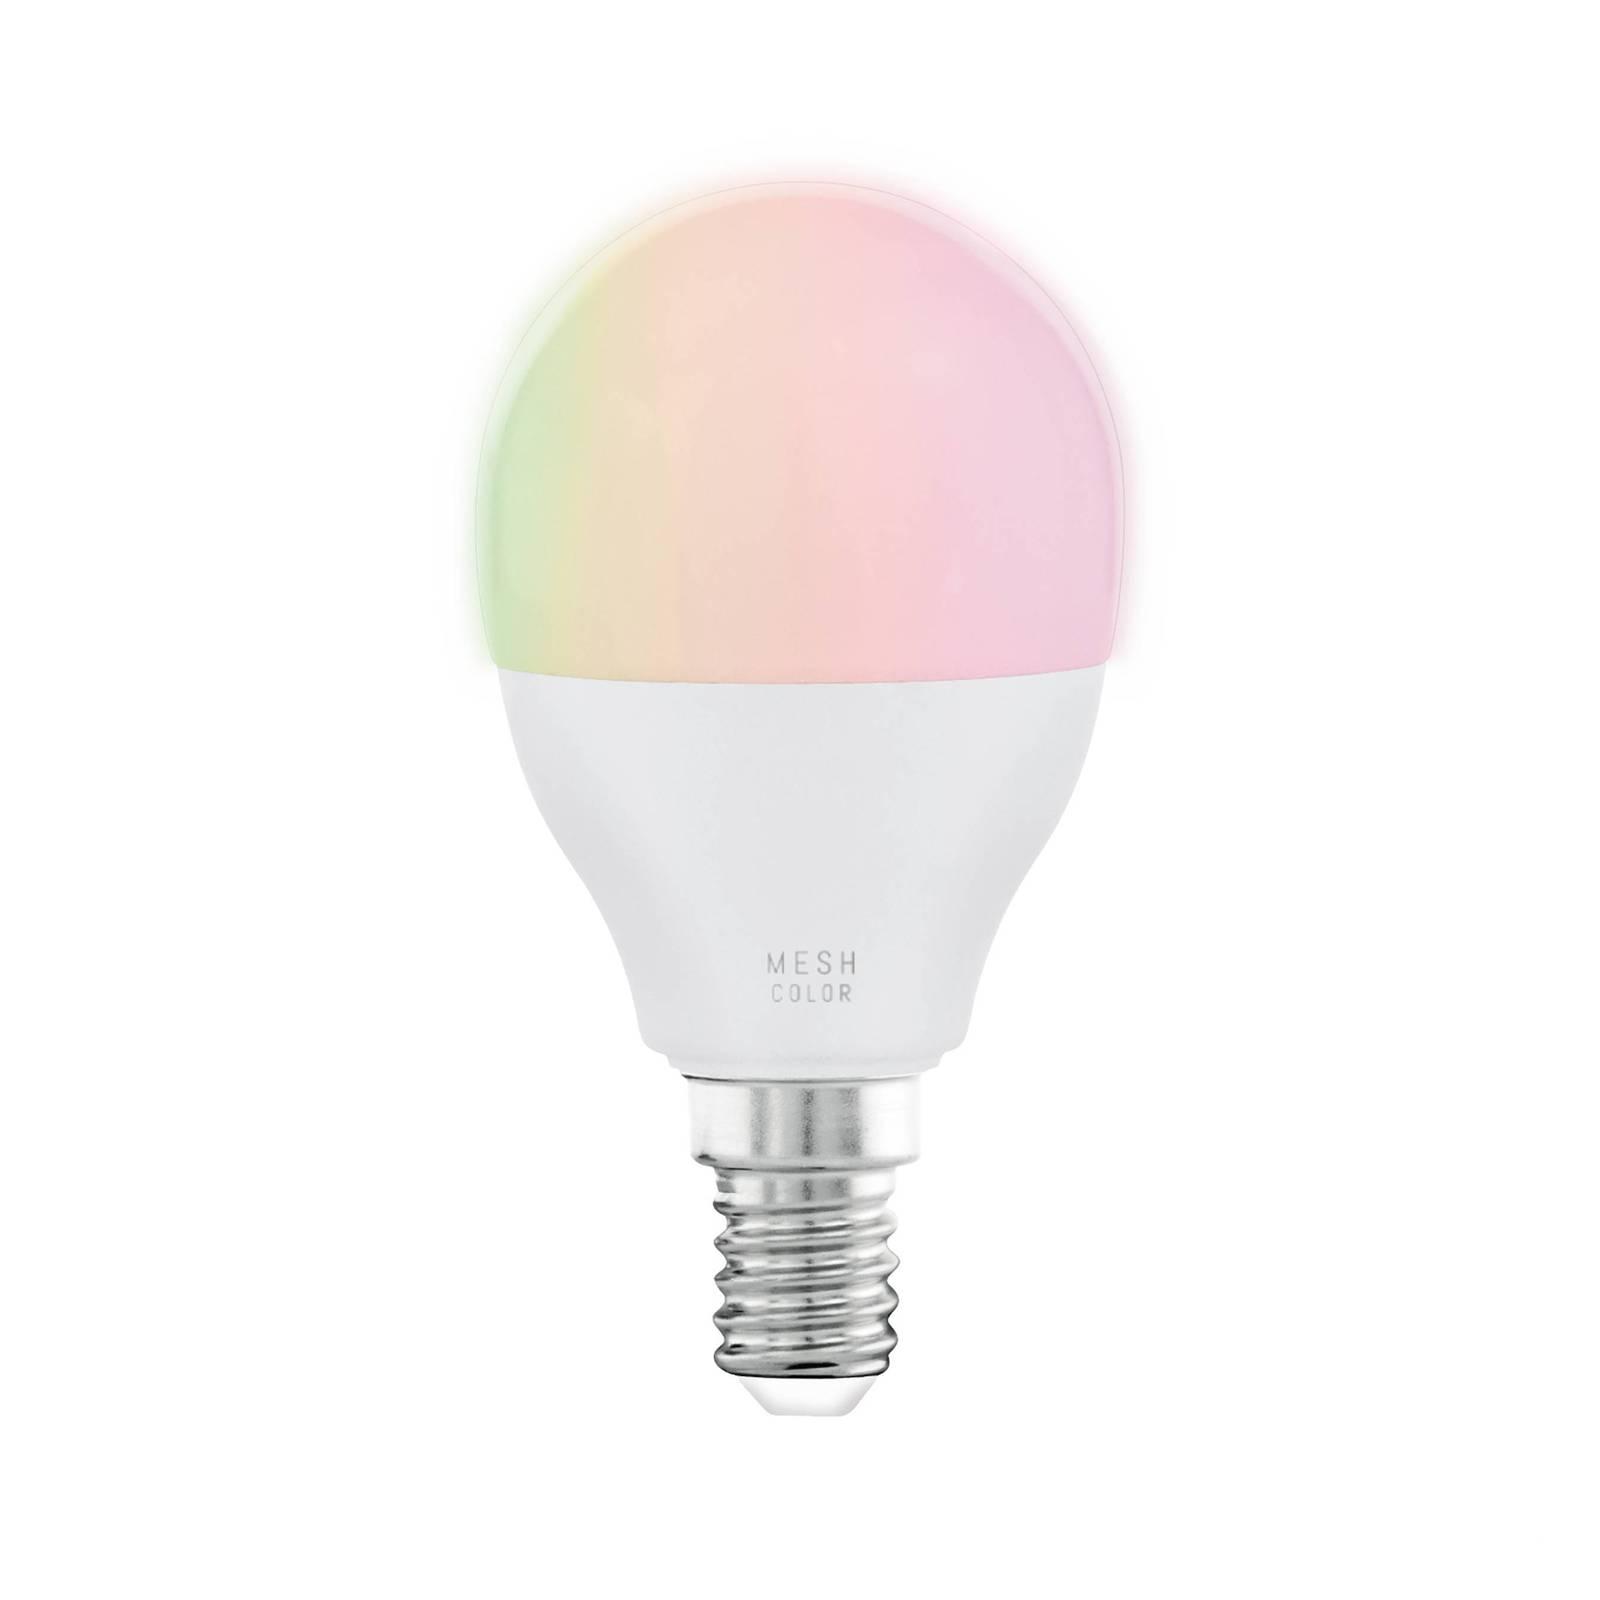 EGLO connect E14 5W LED RGB+Tunable White